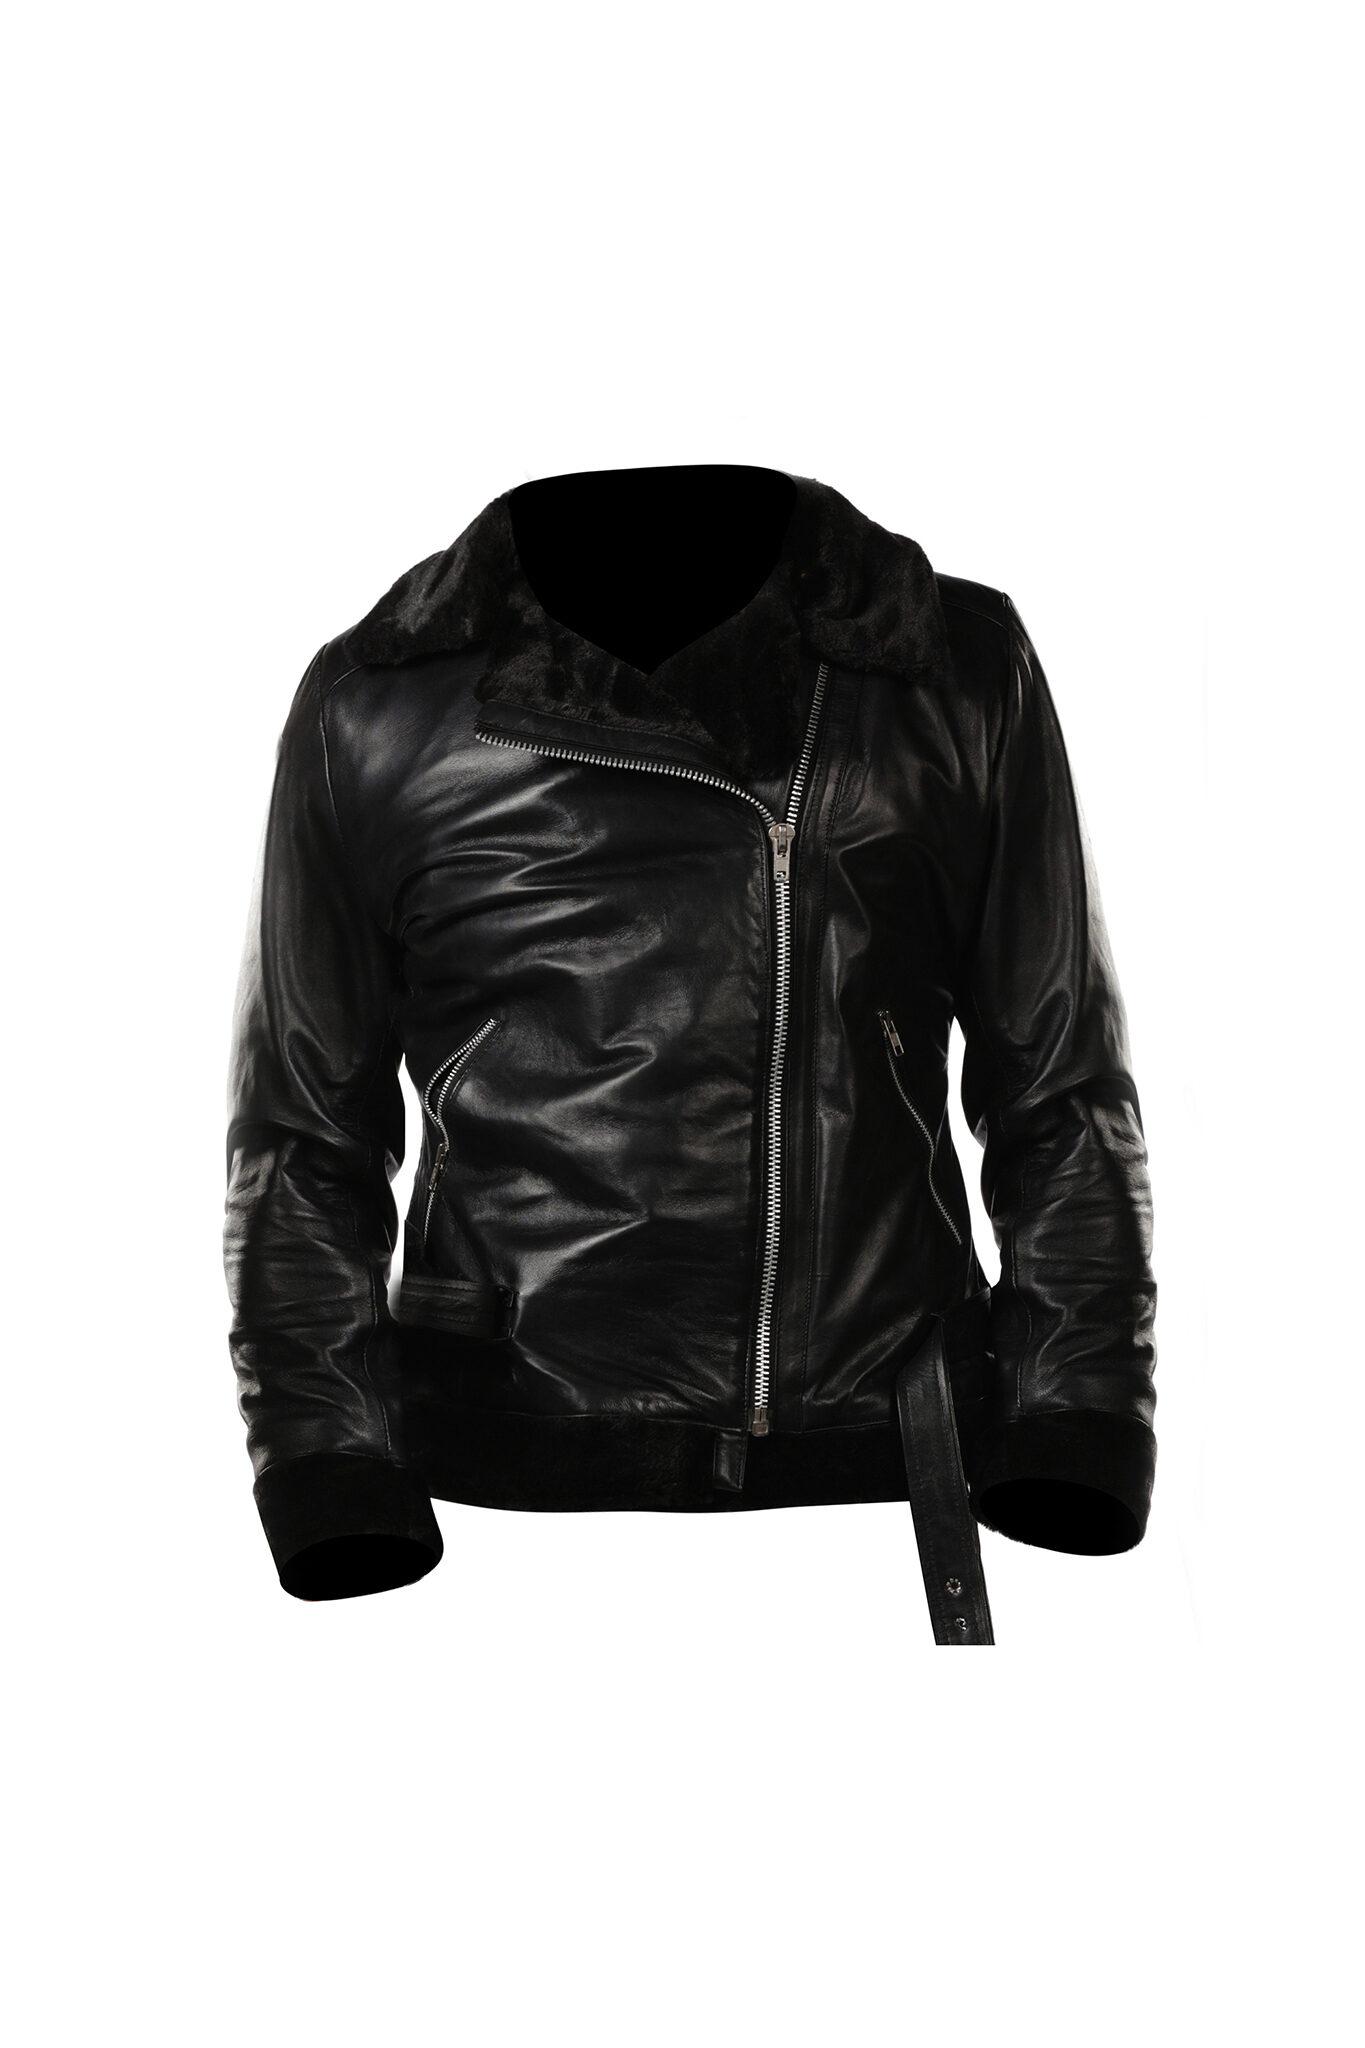 Womens Black Shearling B3 bomber Cockpit Style Leather Jacket